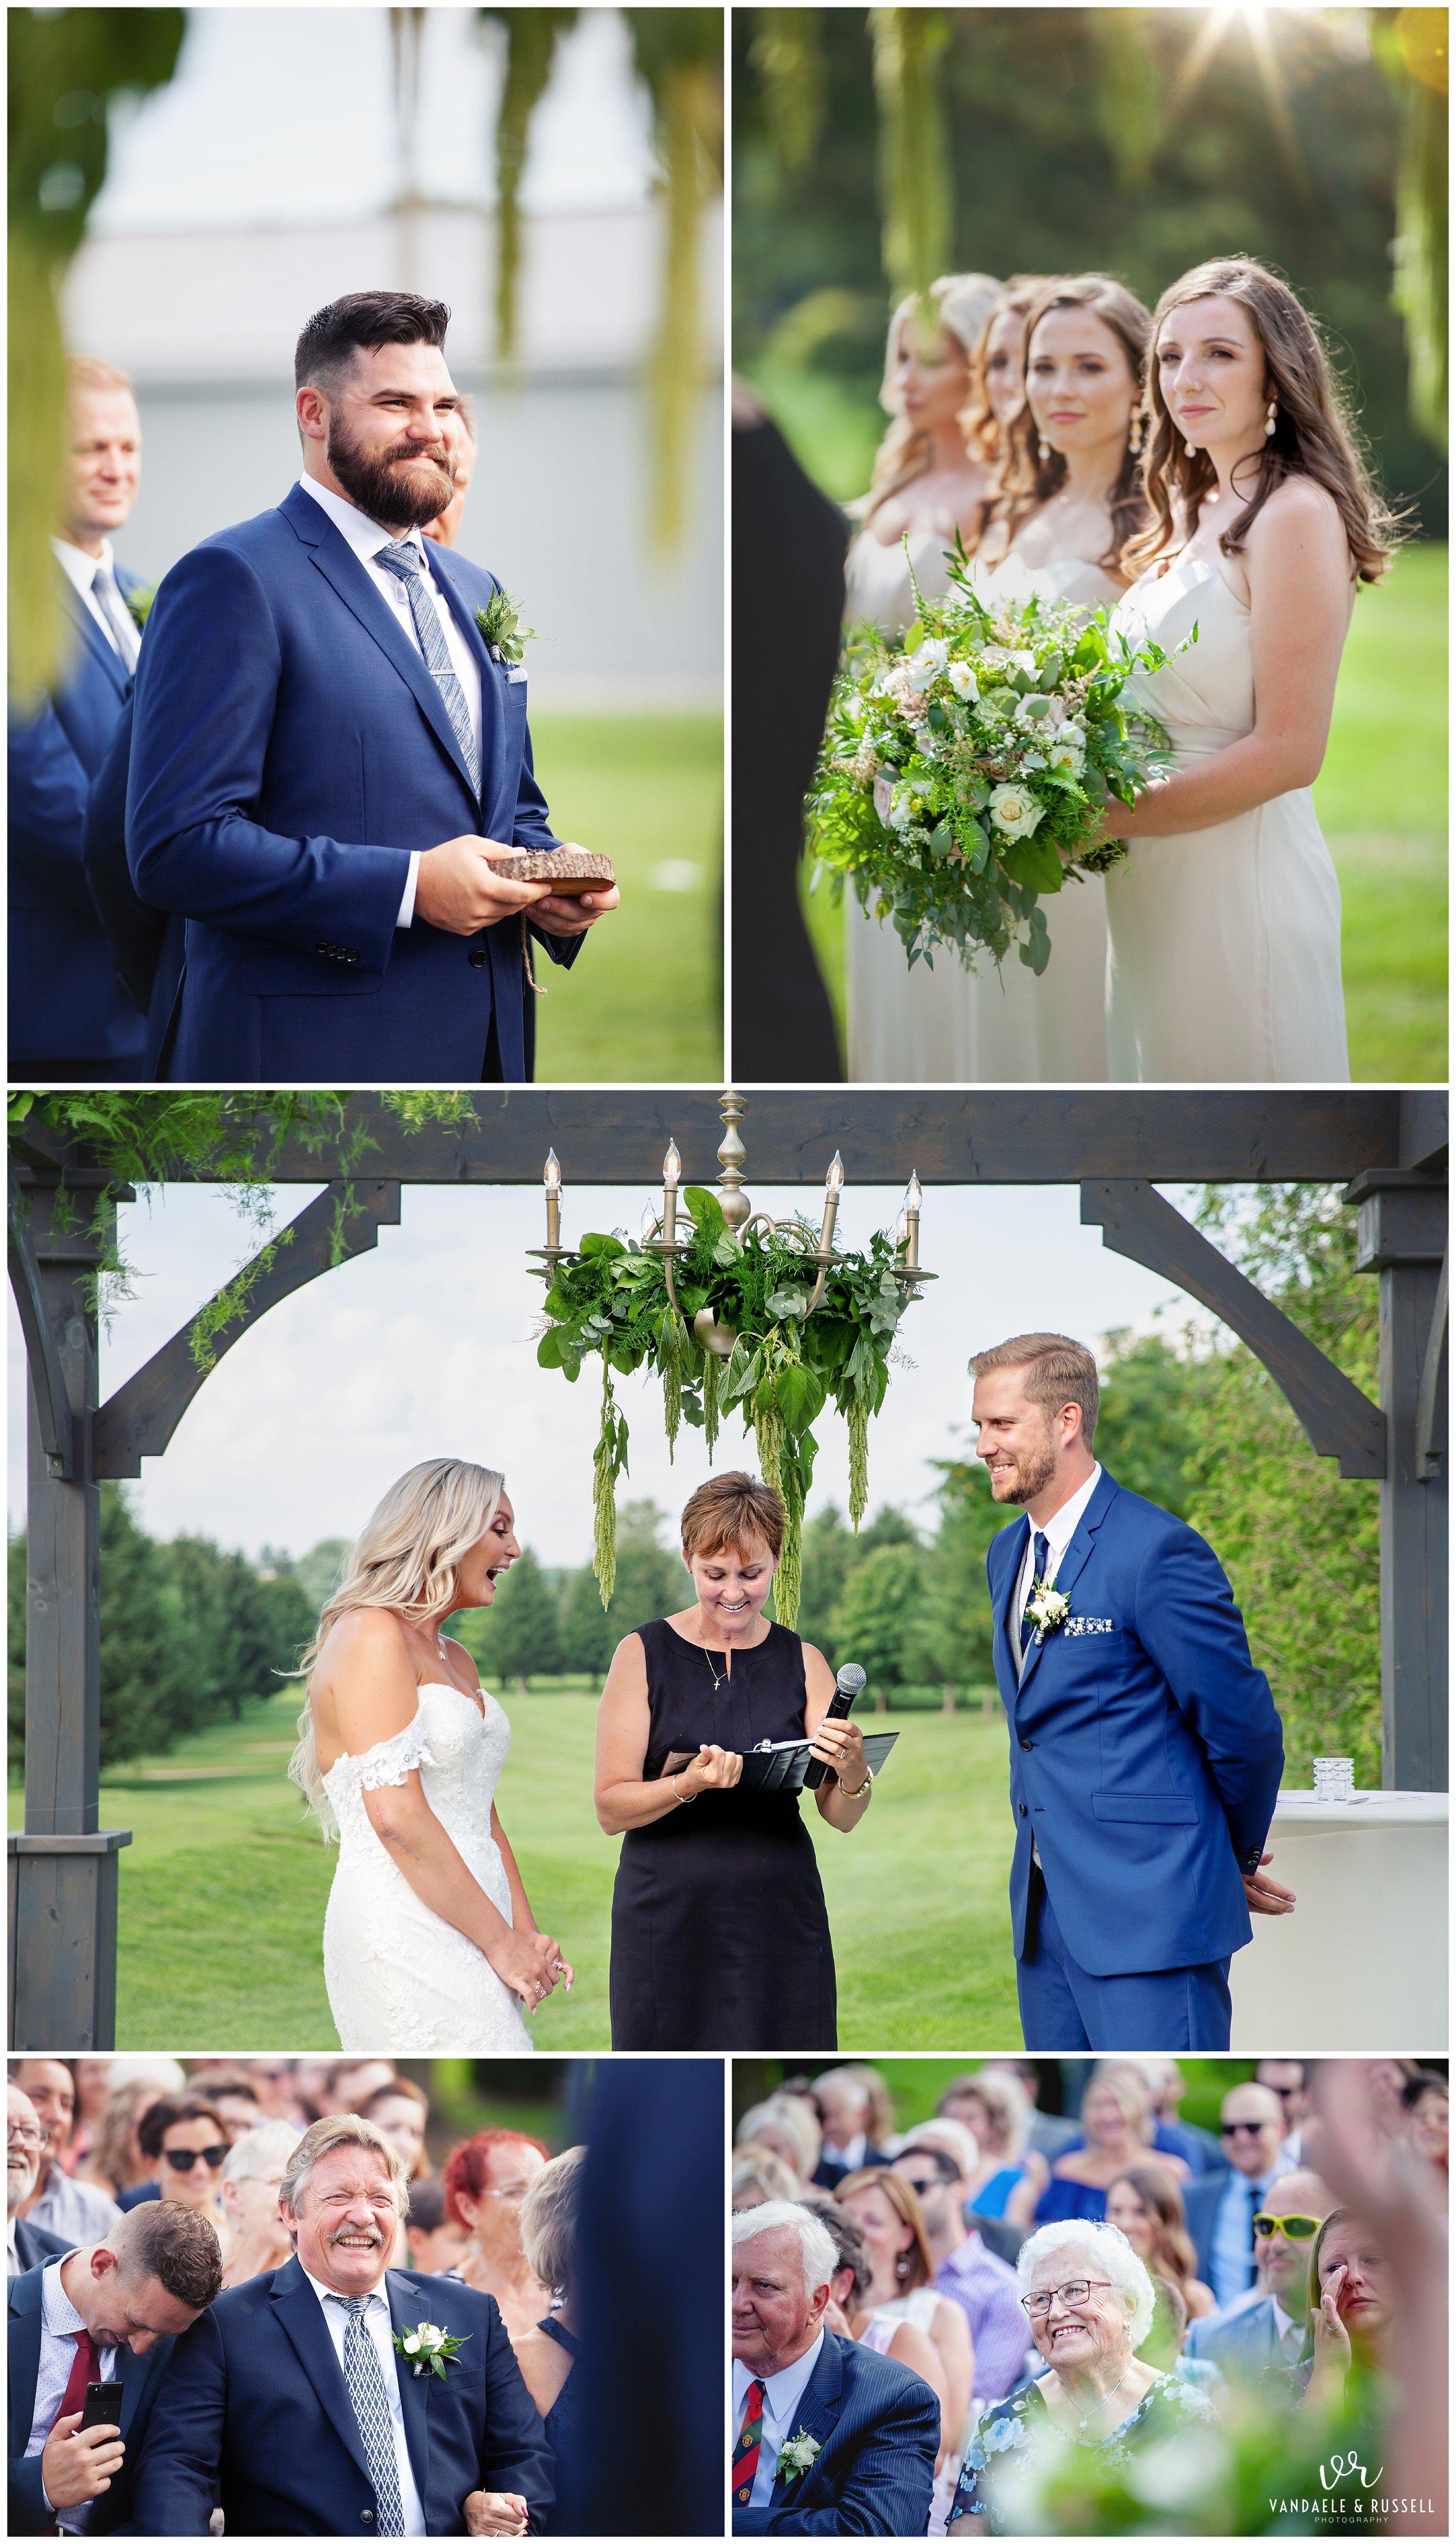 VanDaele-Russell-Wedding-Photography-London-Toronto-Ontario_0168.jpg